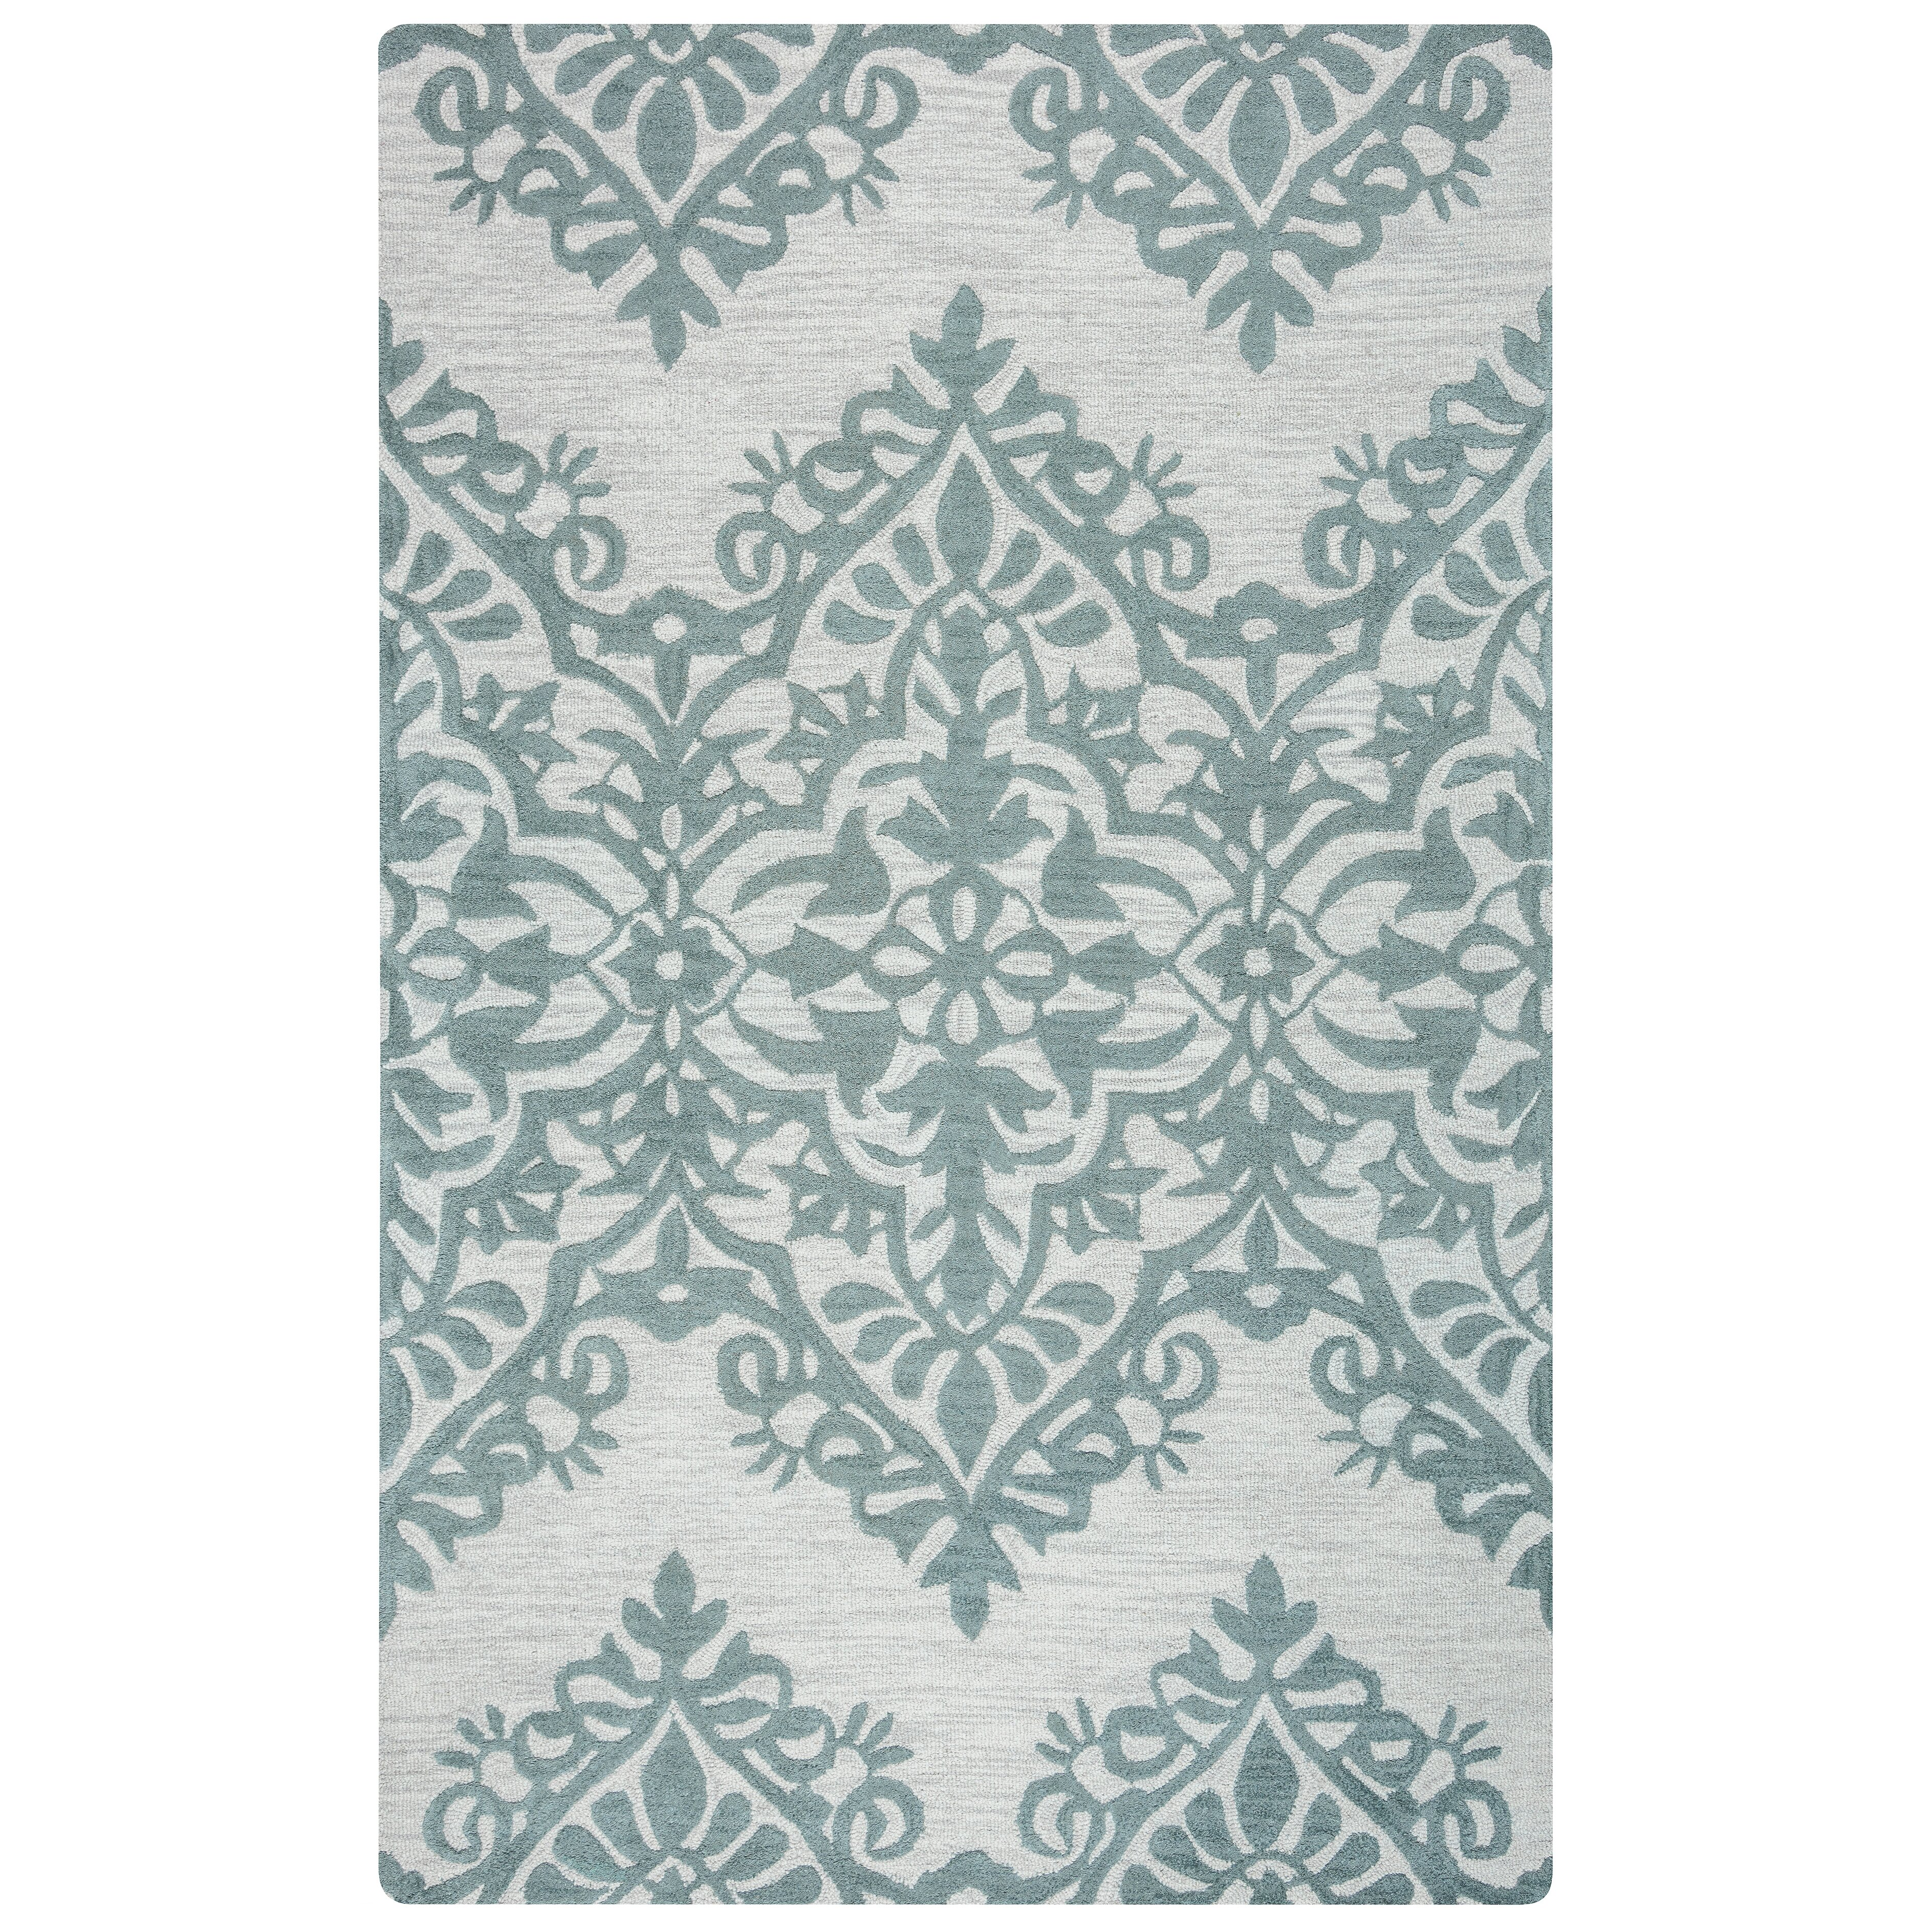 House Of Hampton Ludlow Hand-Tufted Green/Gray Area Rug